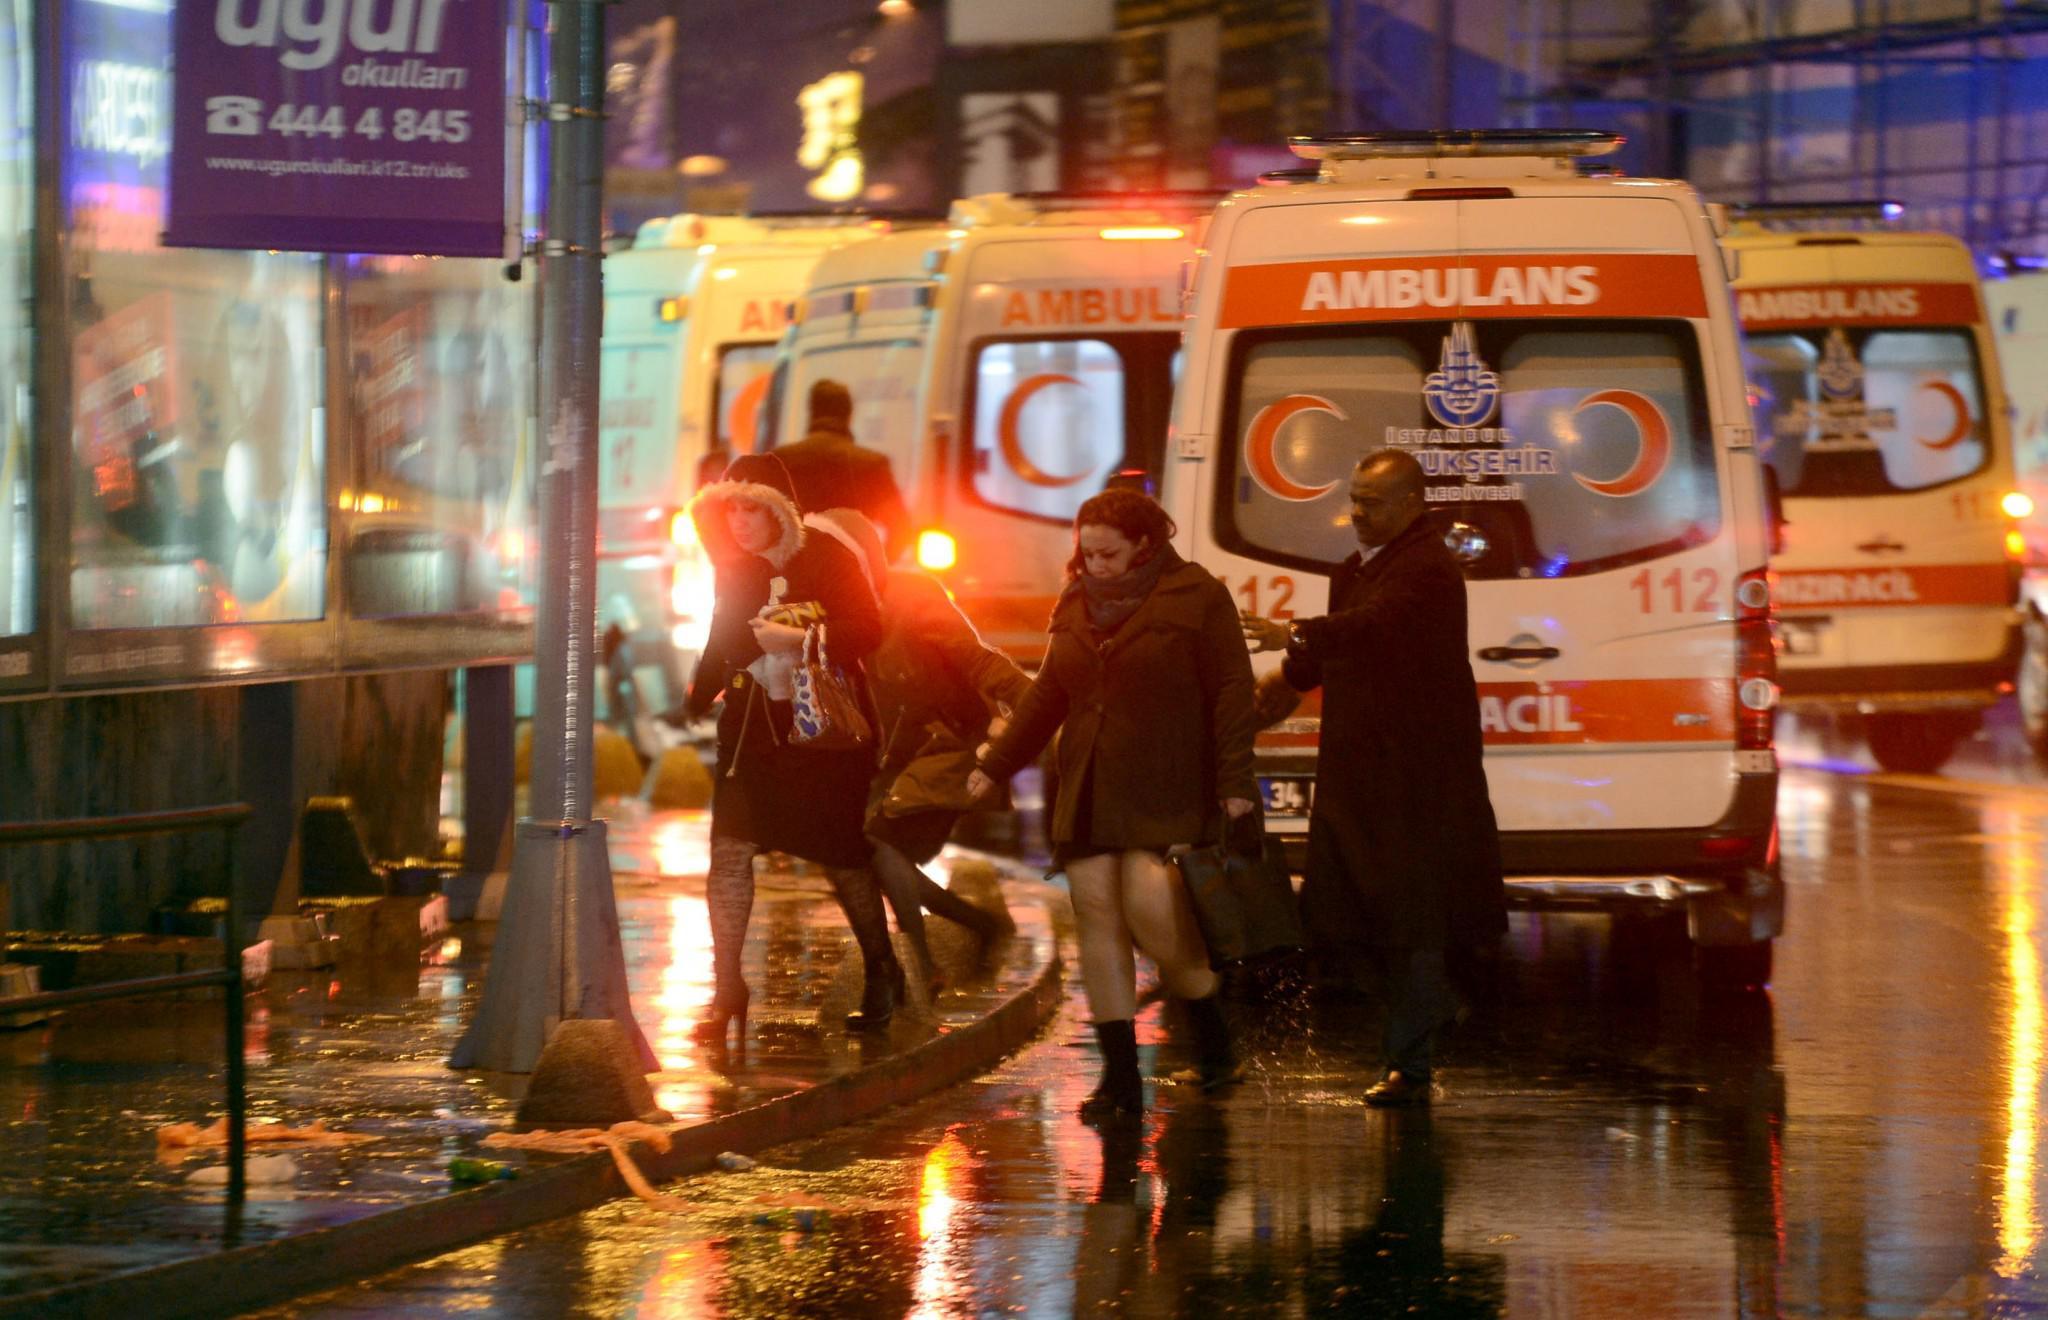 tourkia-epithesi-klamp-nekroi-9 Το Ισλαμικό Κράτος ανέλαβε την ευθύνη για το μακελειό στην Κωνσταντινούπολη